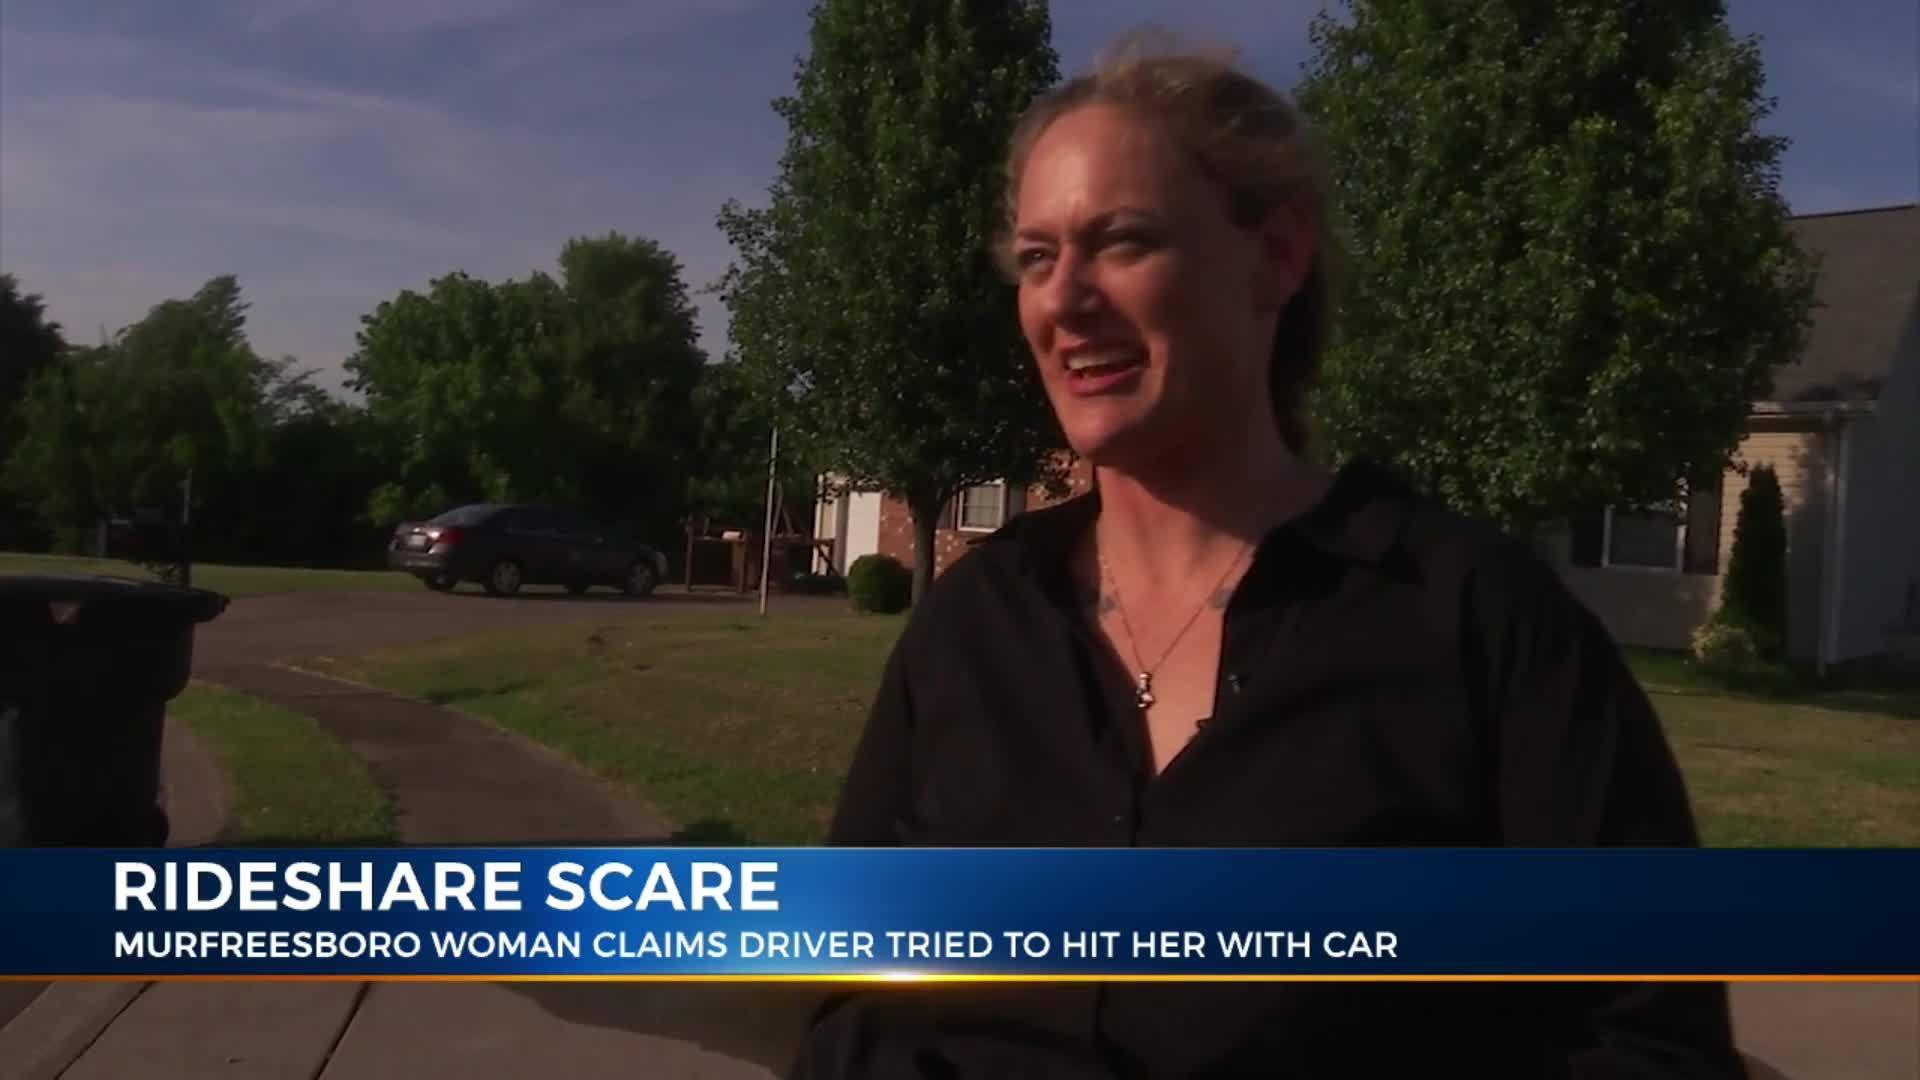 Murfreesboro_woman_says_Uber_driver_trie_6_20190530031437-873703986